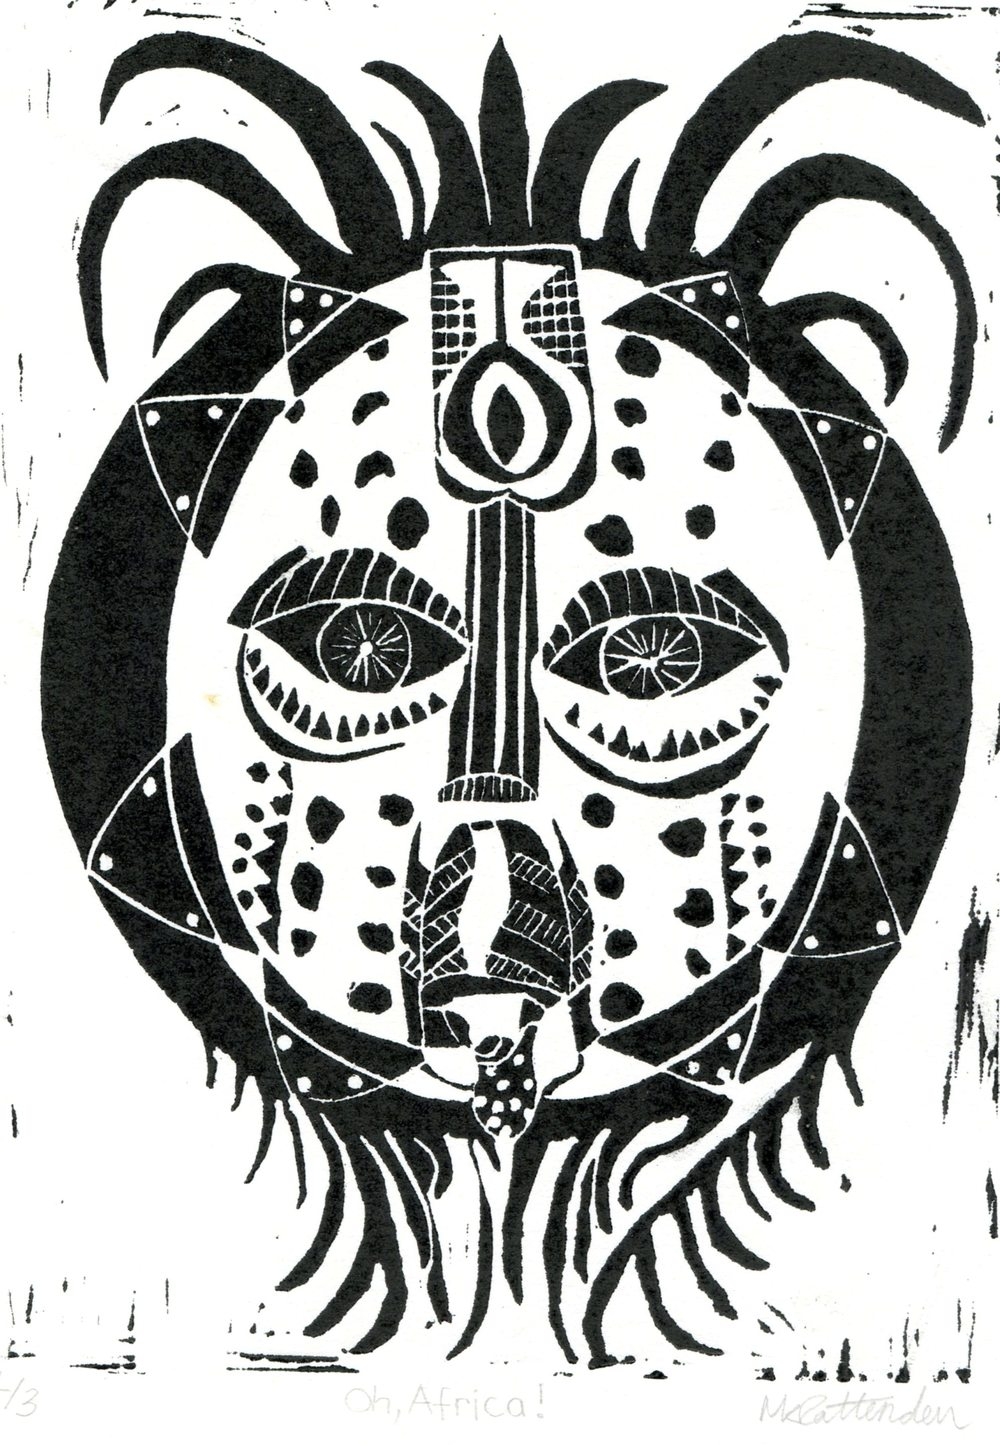 Pattenden,  Mhairi  23 Oh, Africa! Lino print